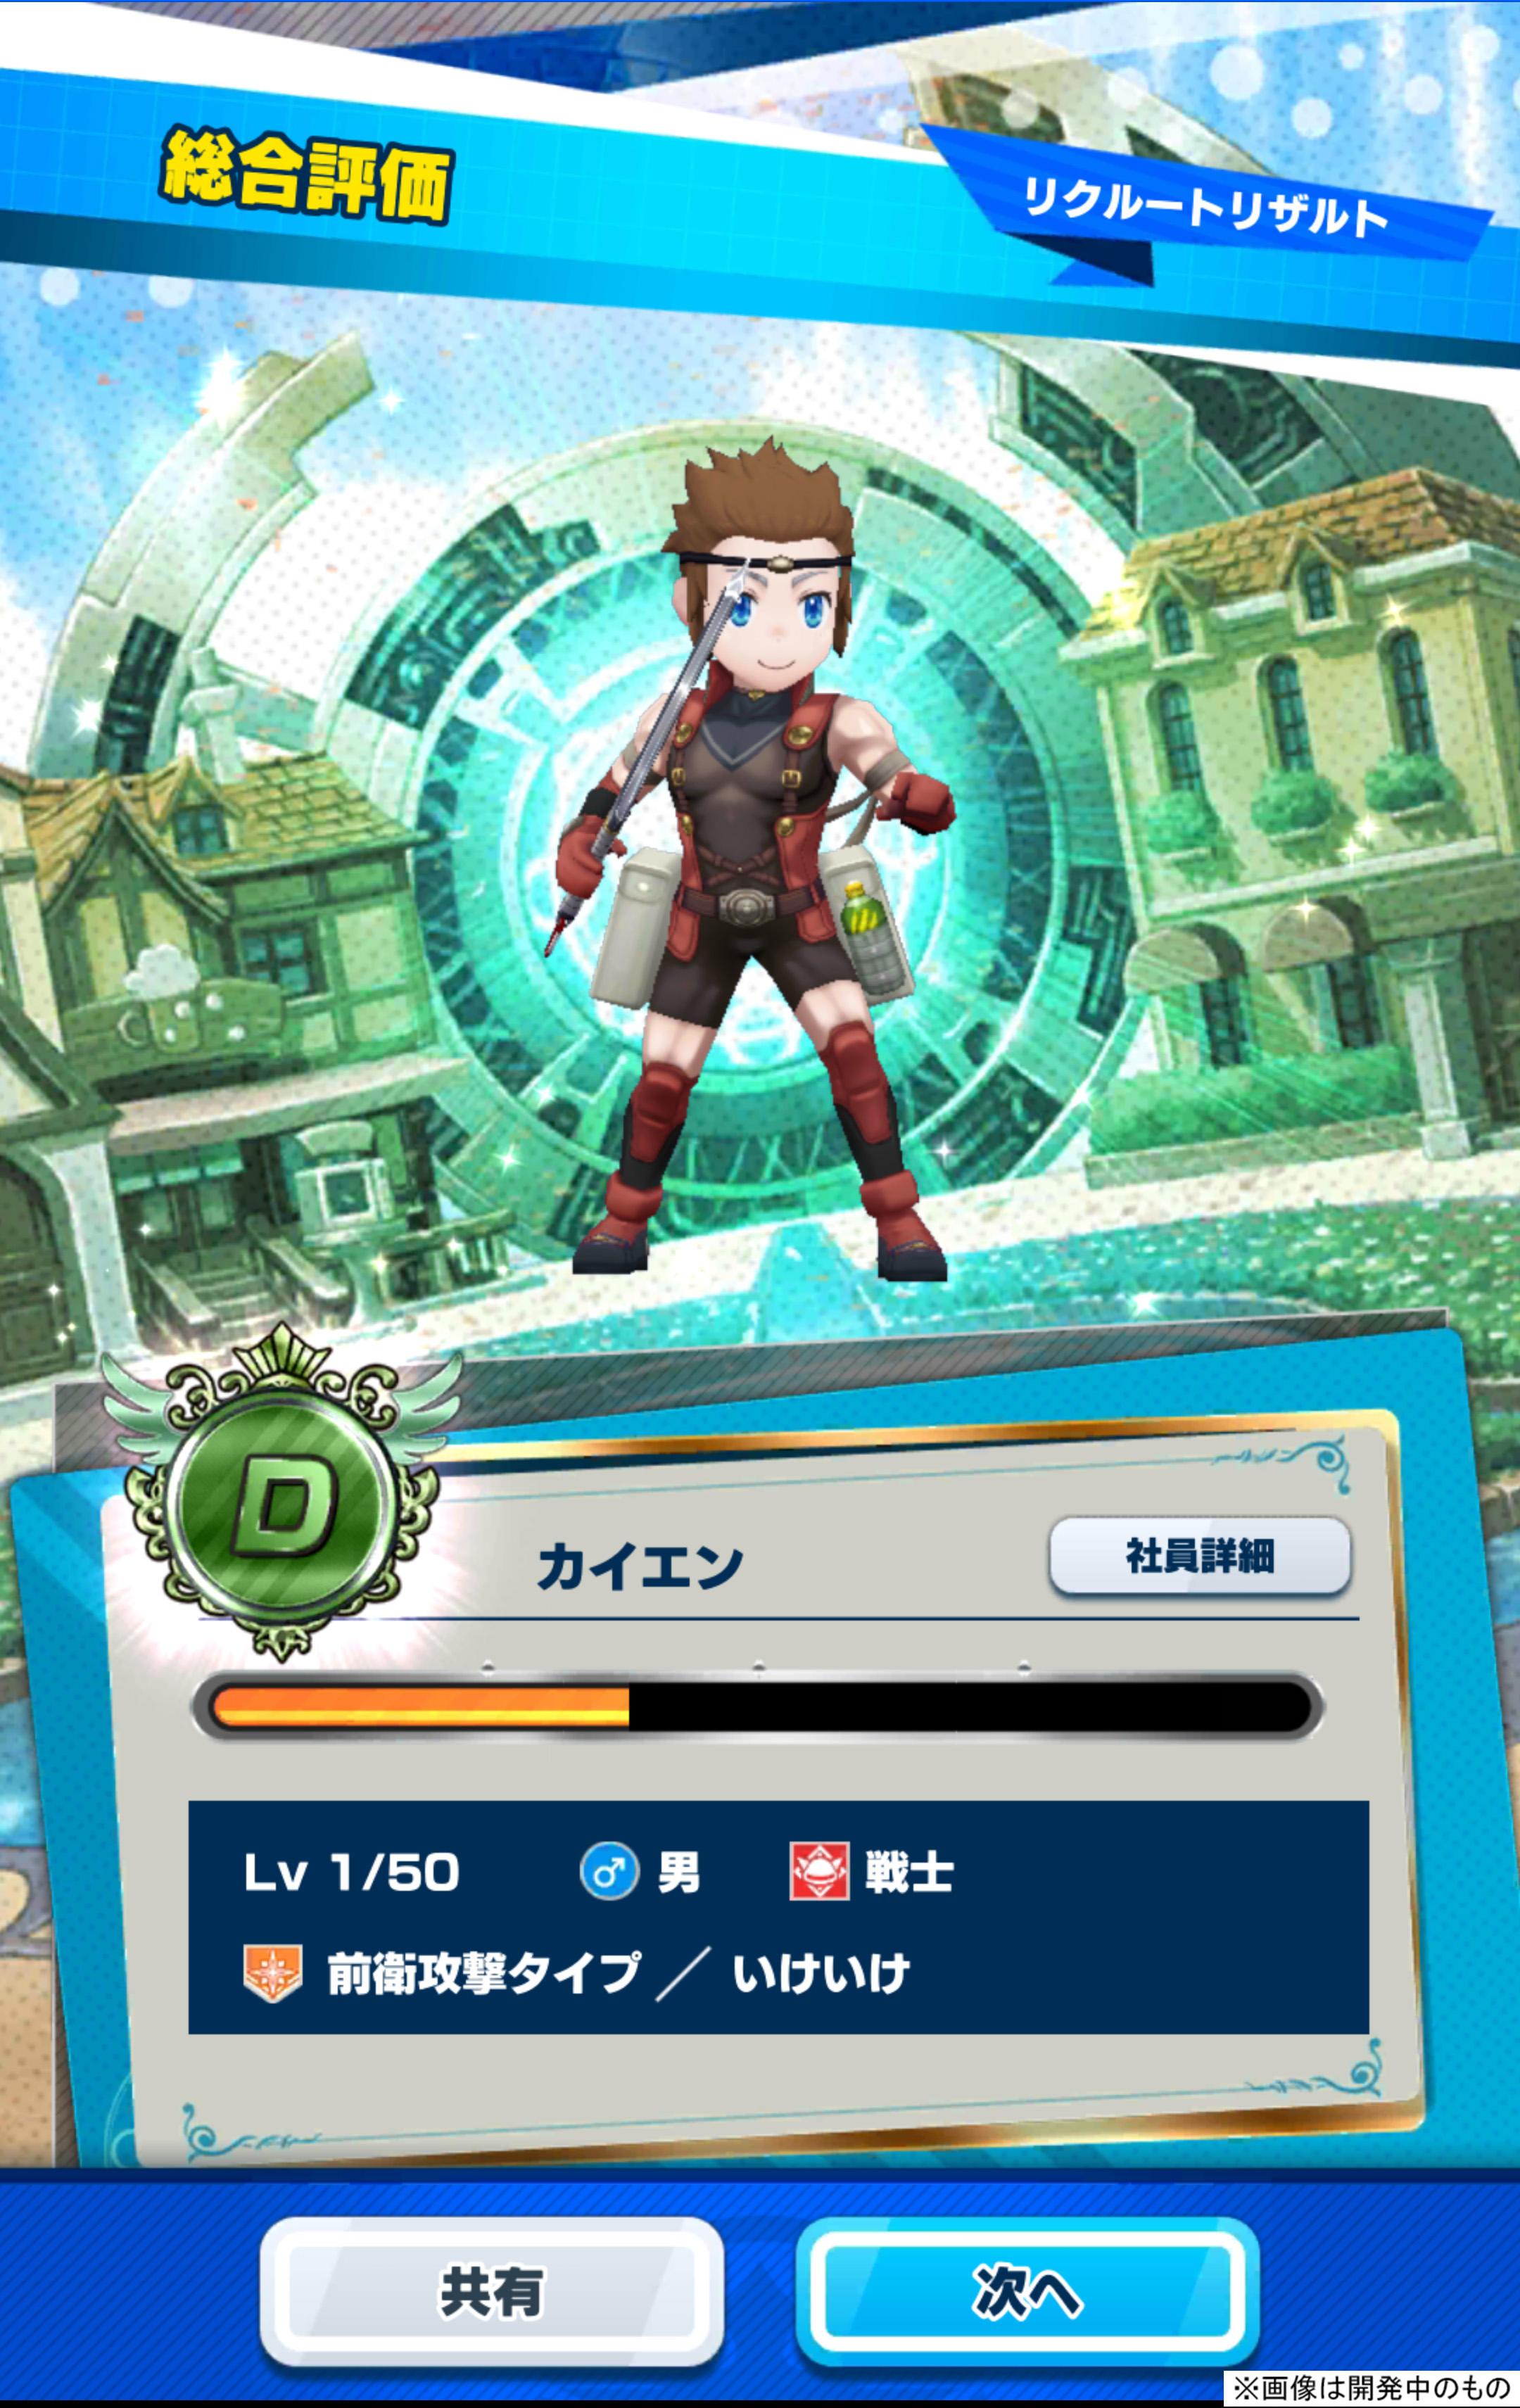 /theme/dengekionline/shachibato/images/system/recruit05